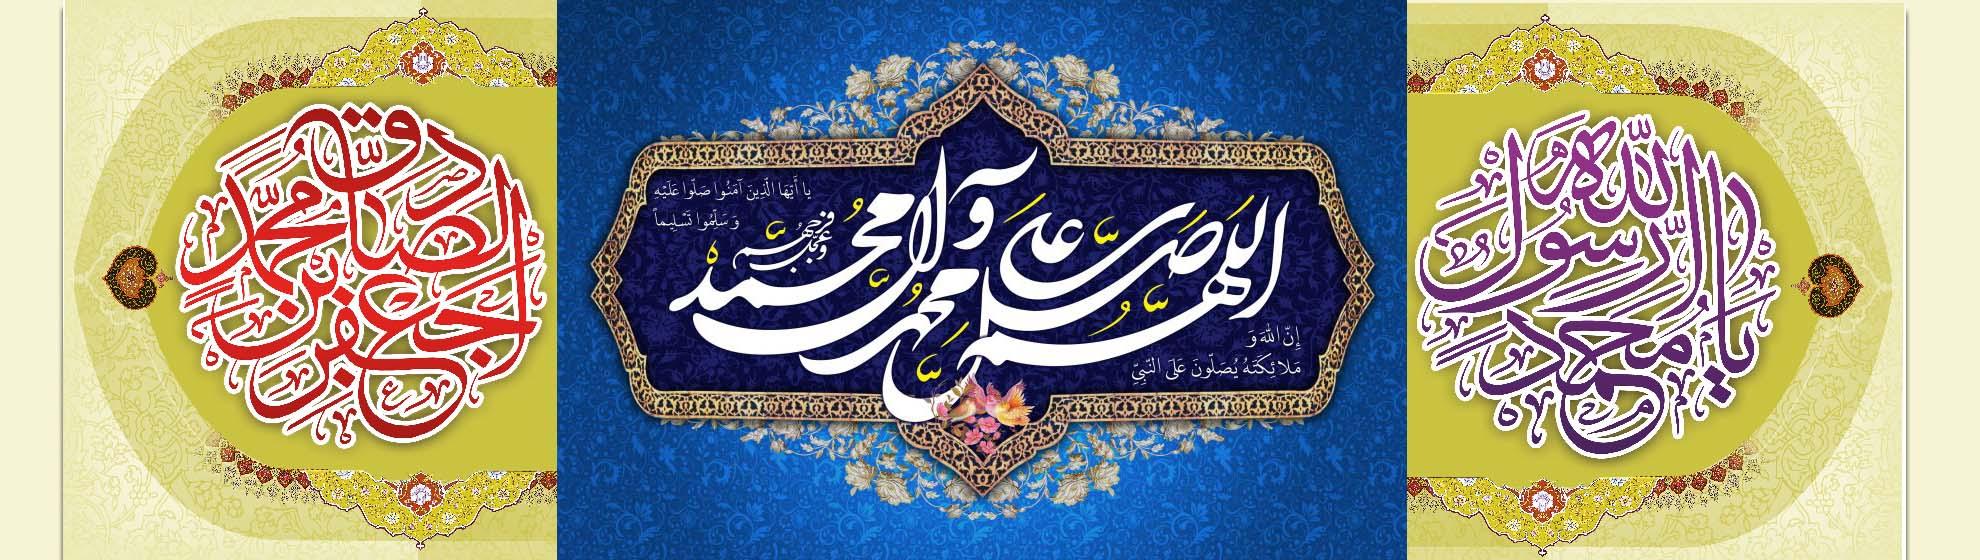 Milad-un-Nabi Mubarak